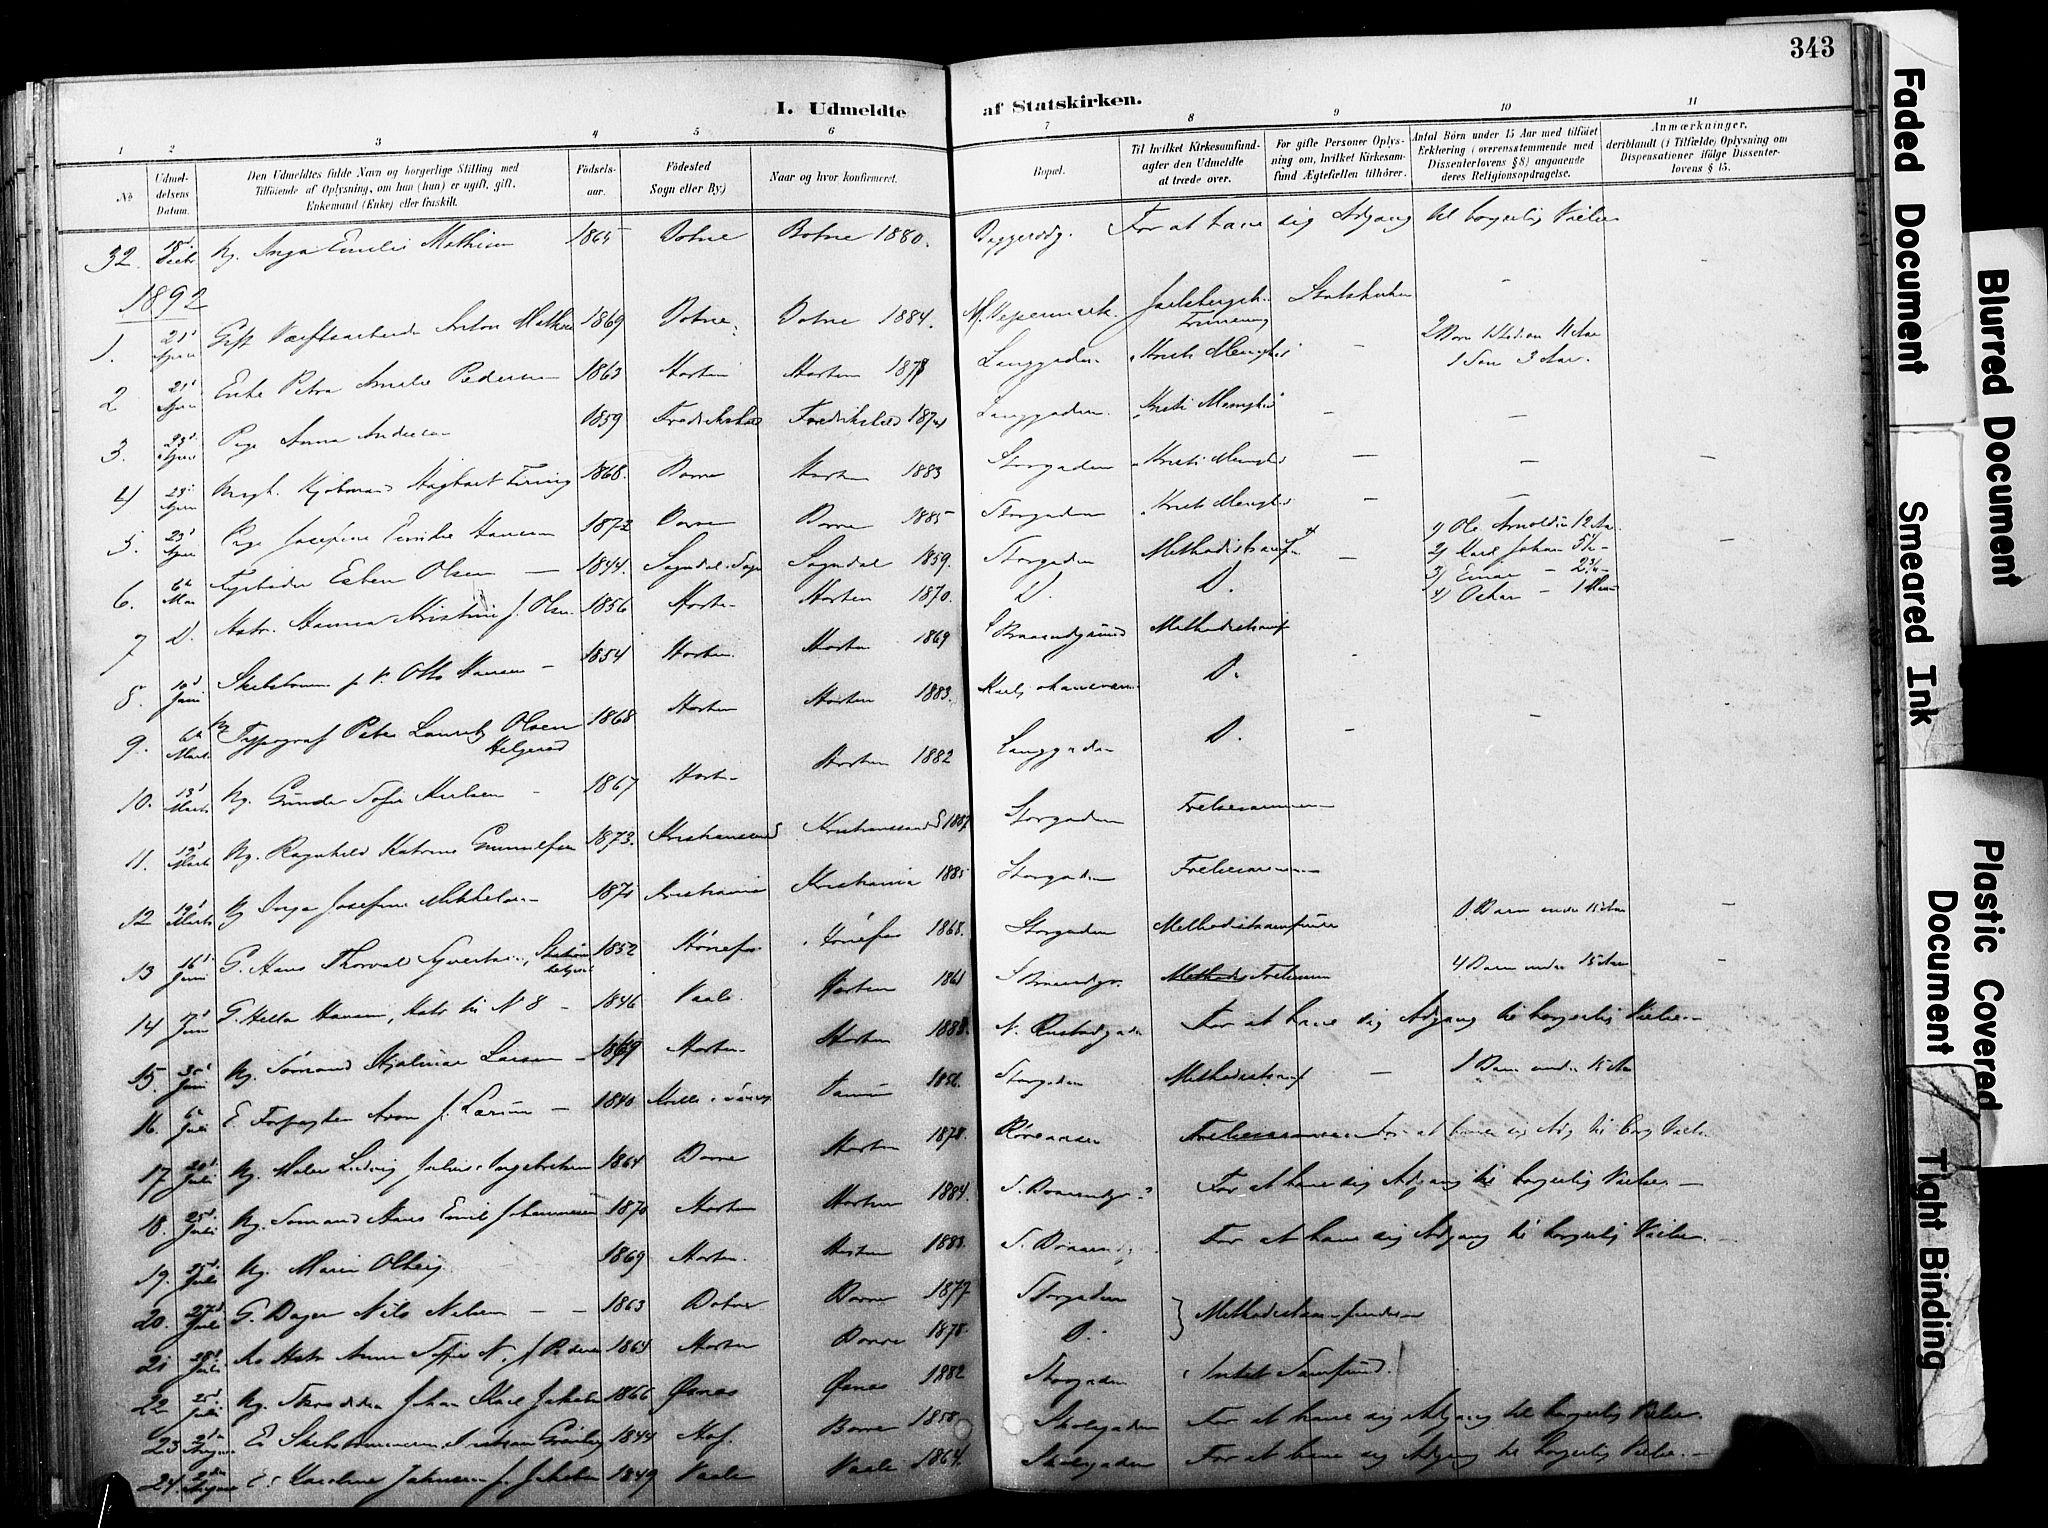 SAKO, Horten kirkebøker, F/Fa/L0004: Parish register (official) no. 4, 1888-1895, p. 343